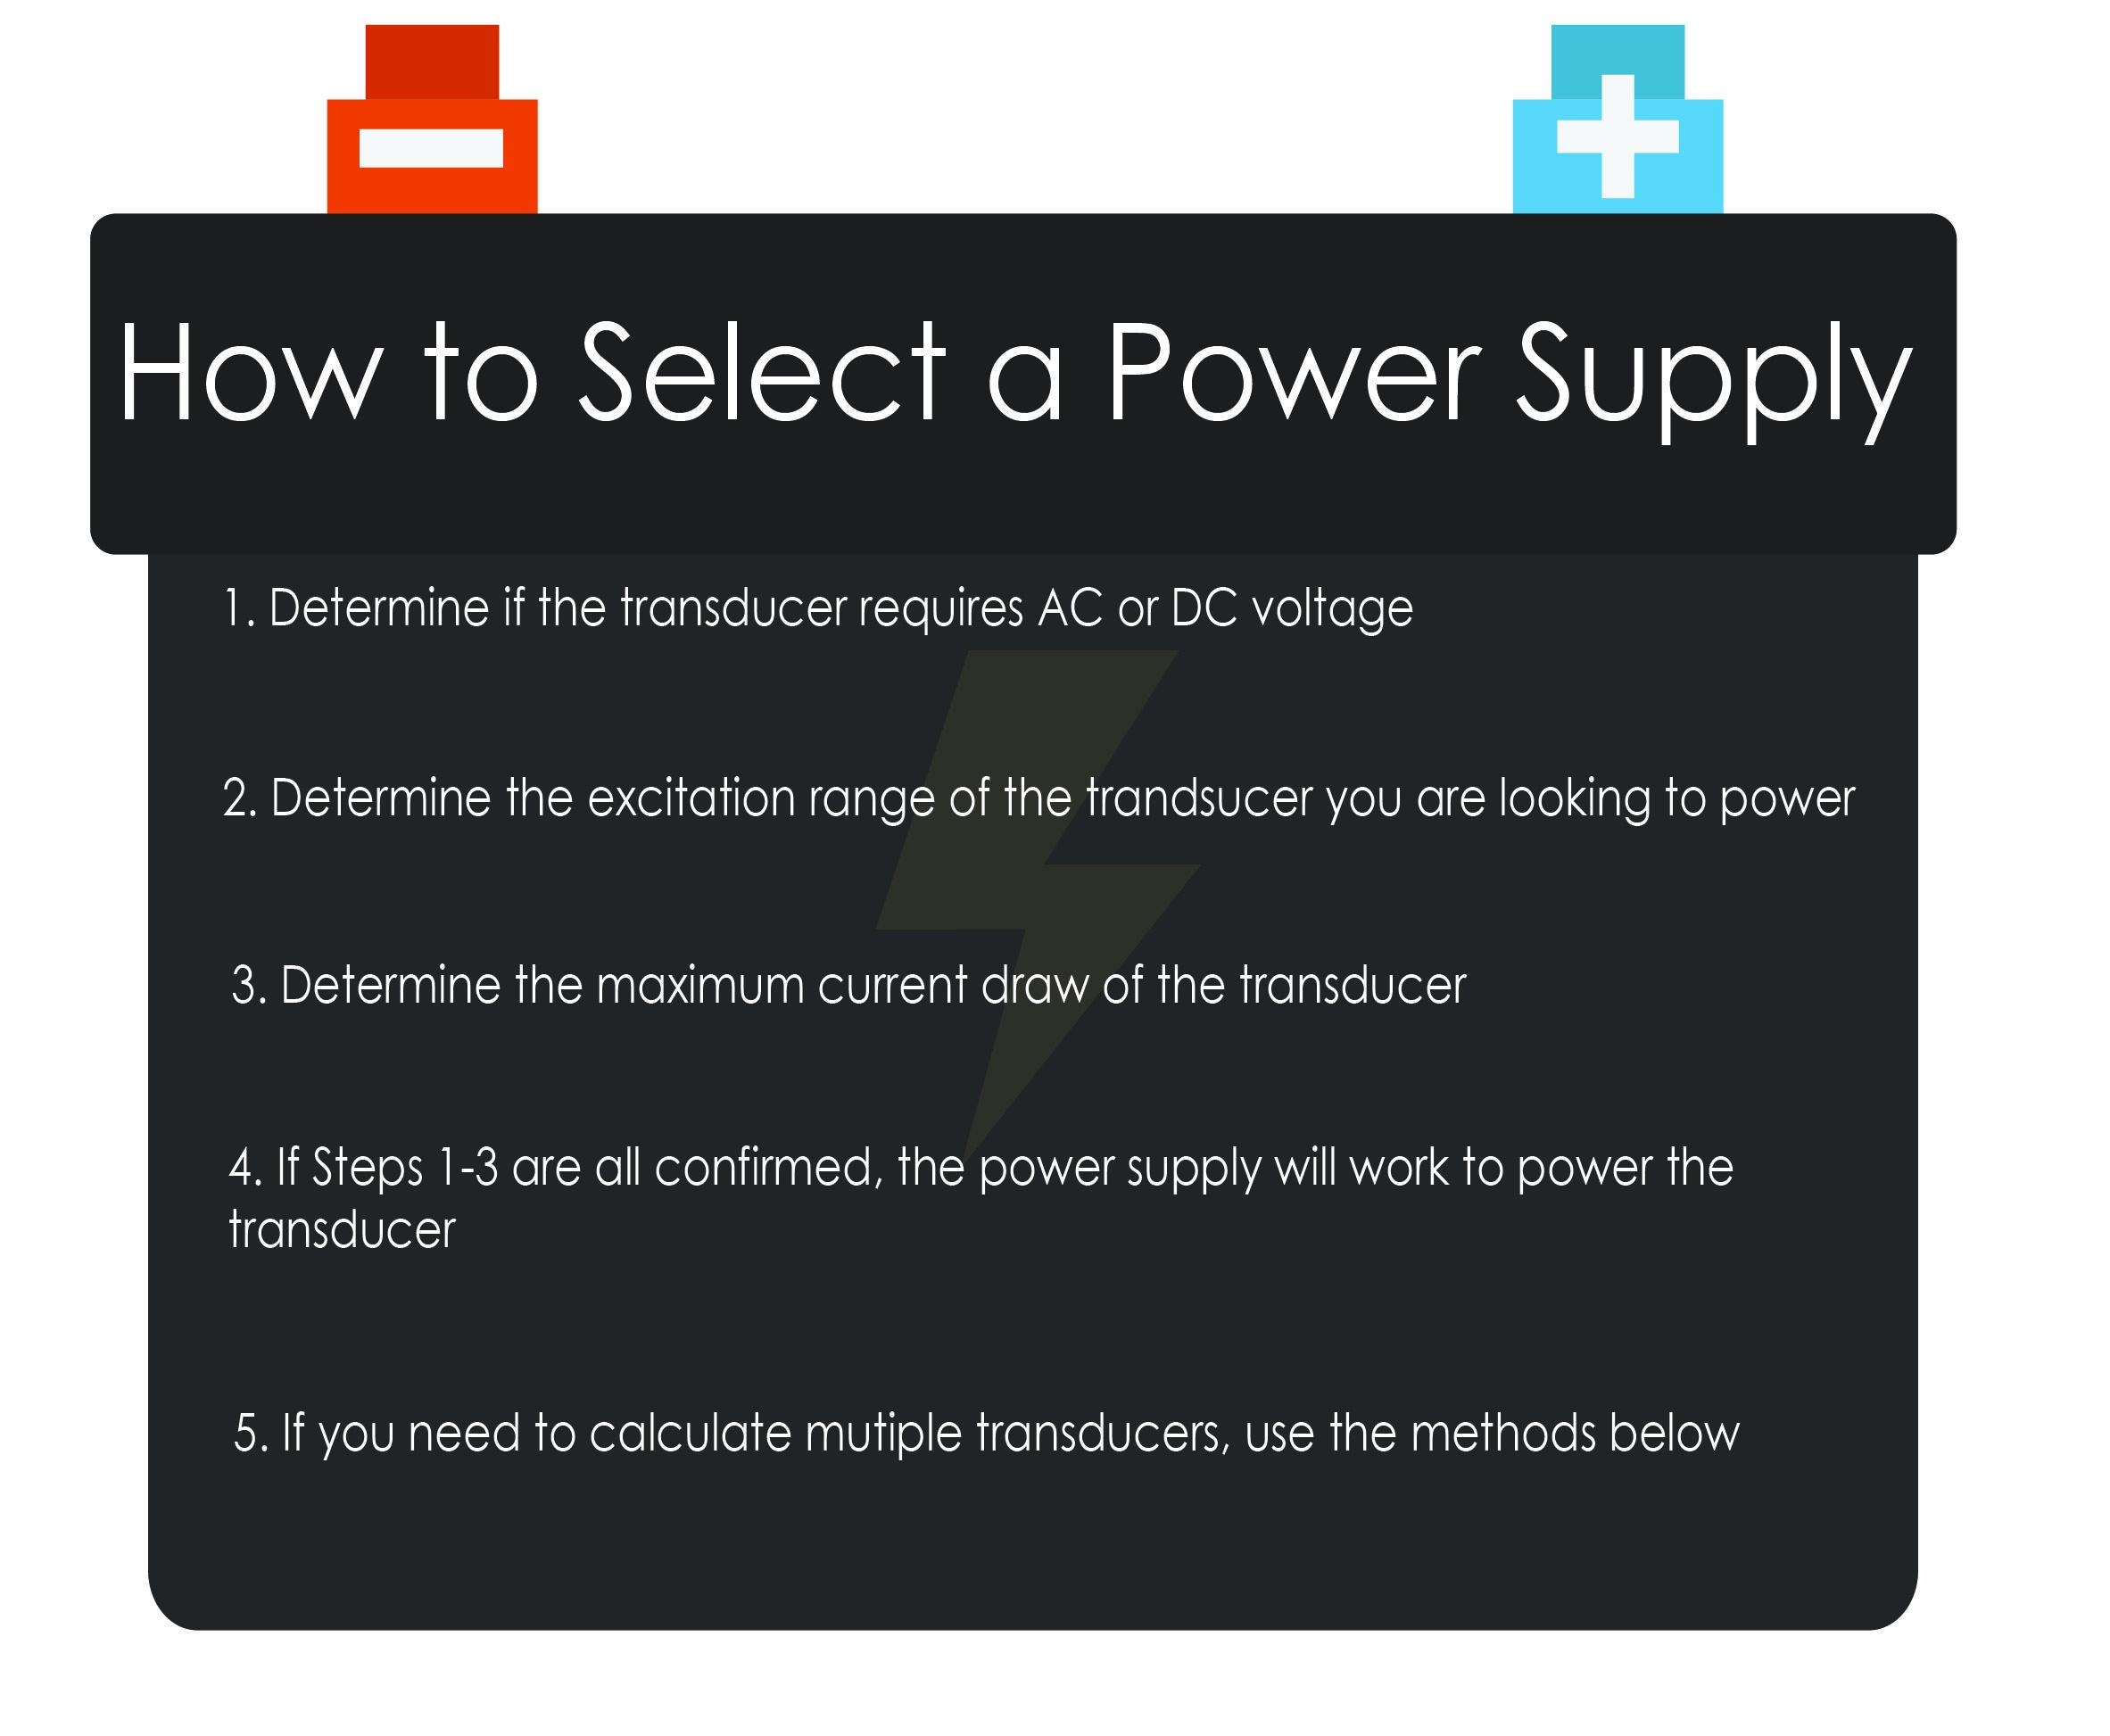 power_supply-01-1.jpg